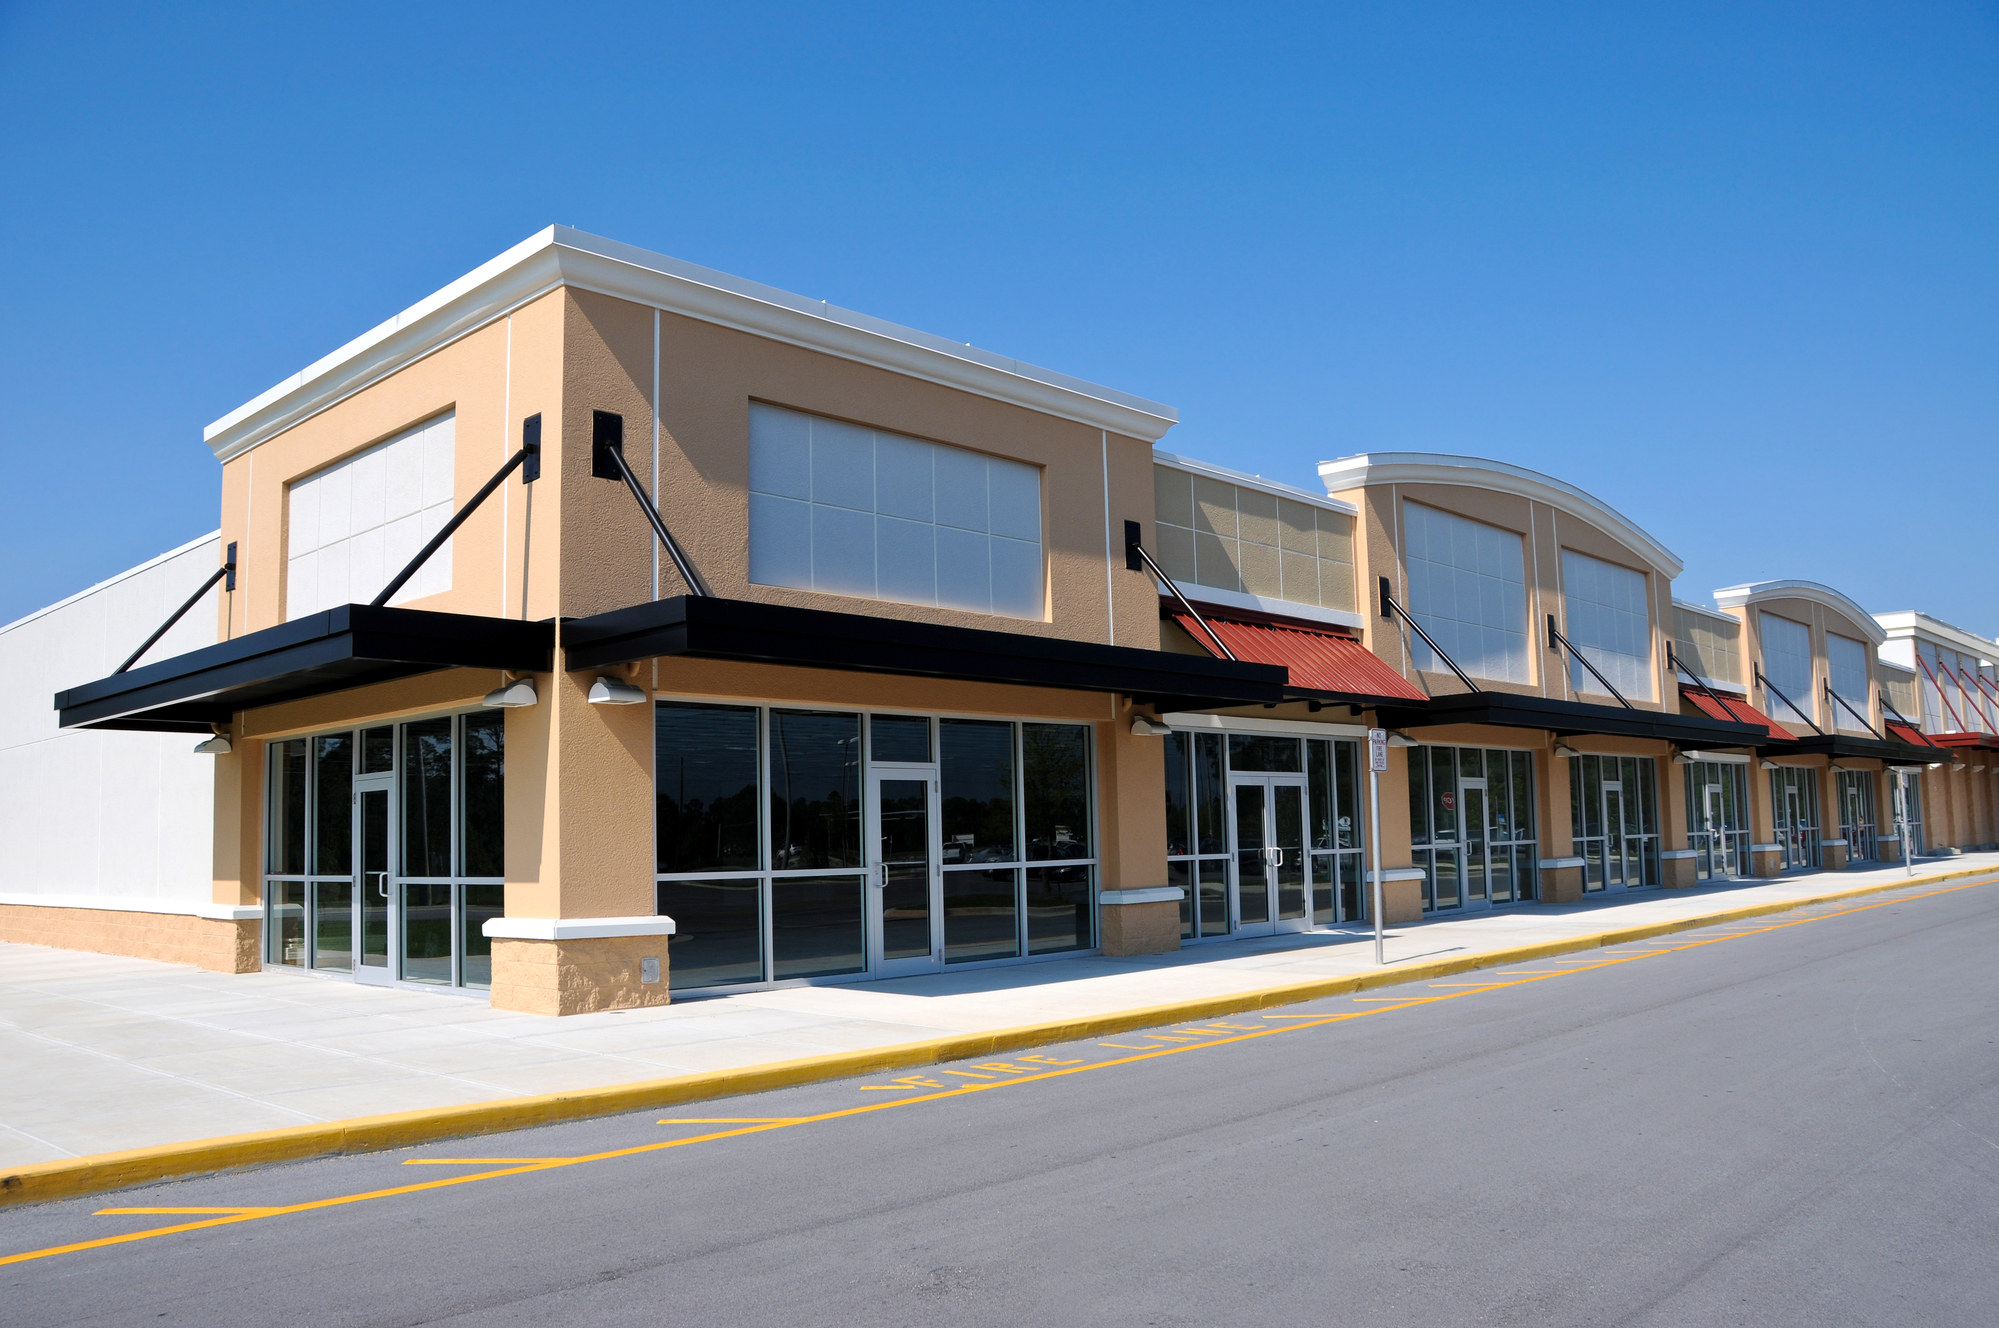 Boulder CO Painters Announces New Location for Foothills Painting LLC – Boulder 15